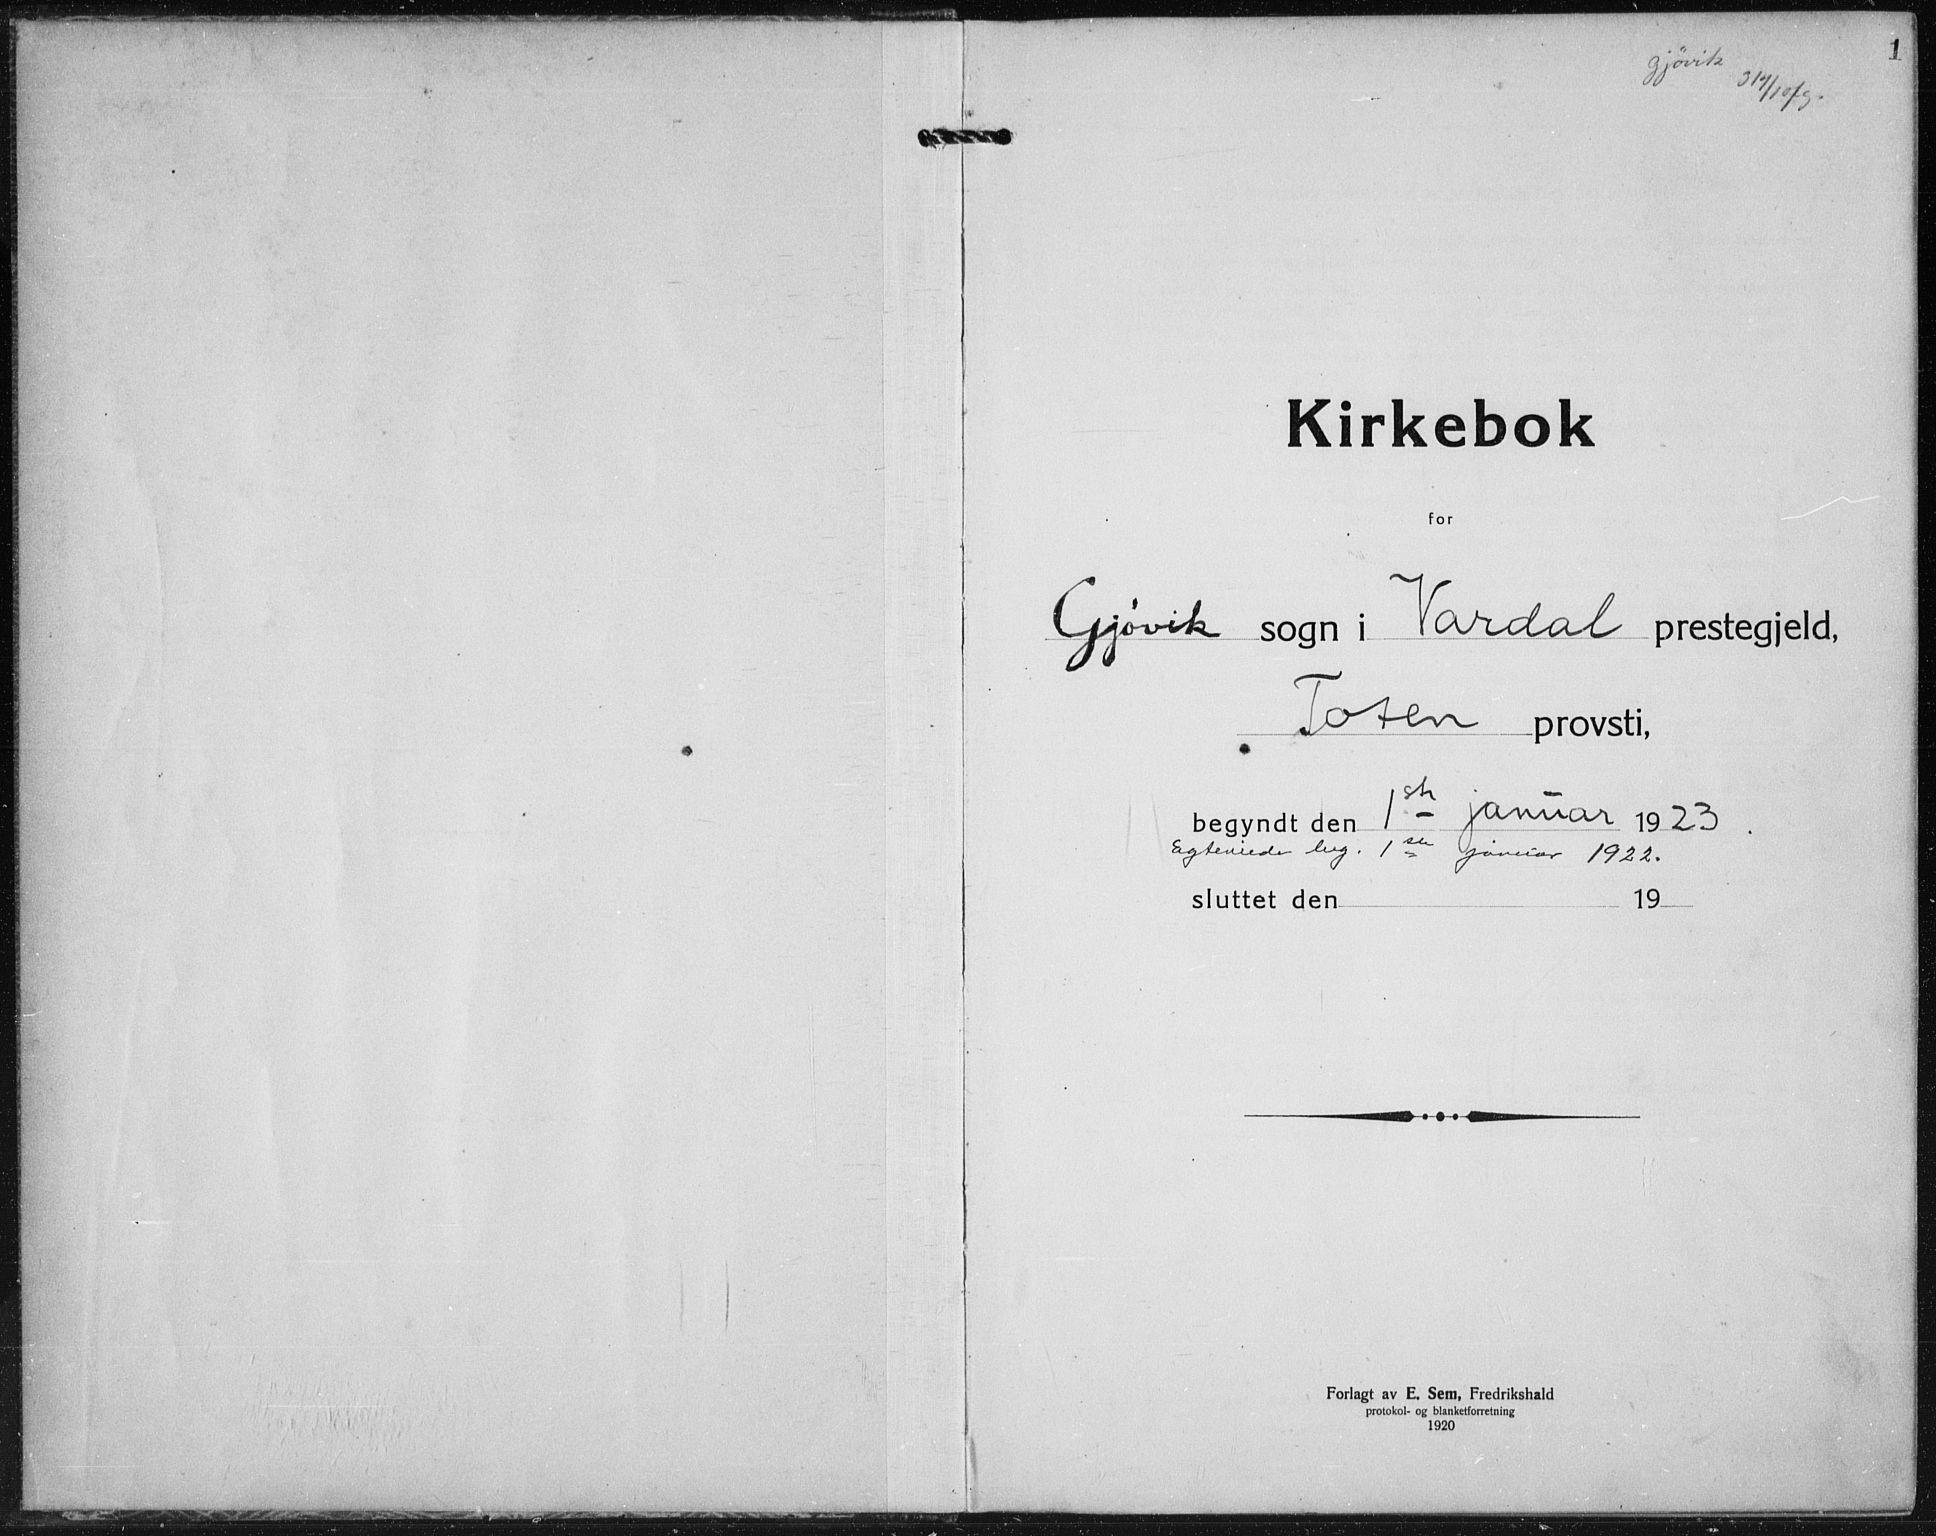 SAH, Vardal prestekontor, H/Ha/Hab/L0017: Klokkerbok nr. 17, 1922-1941, s. 1